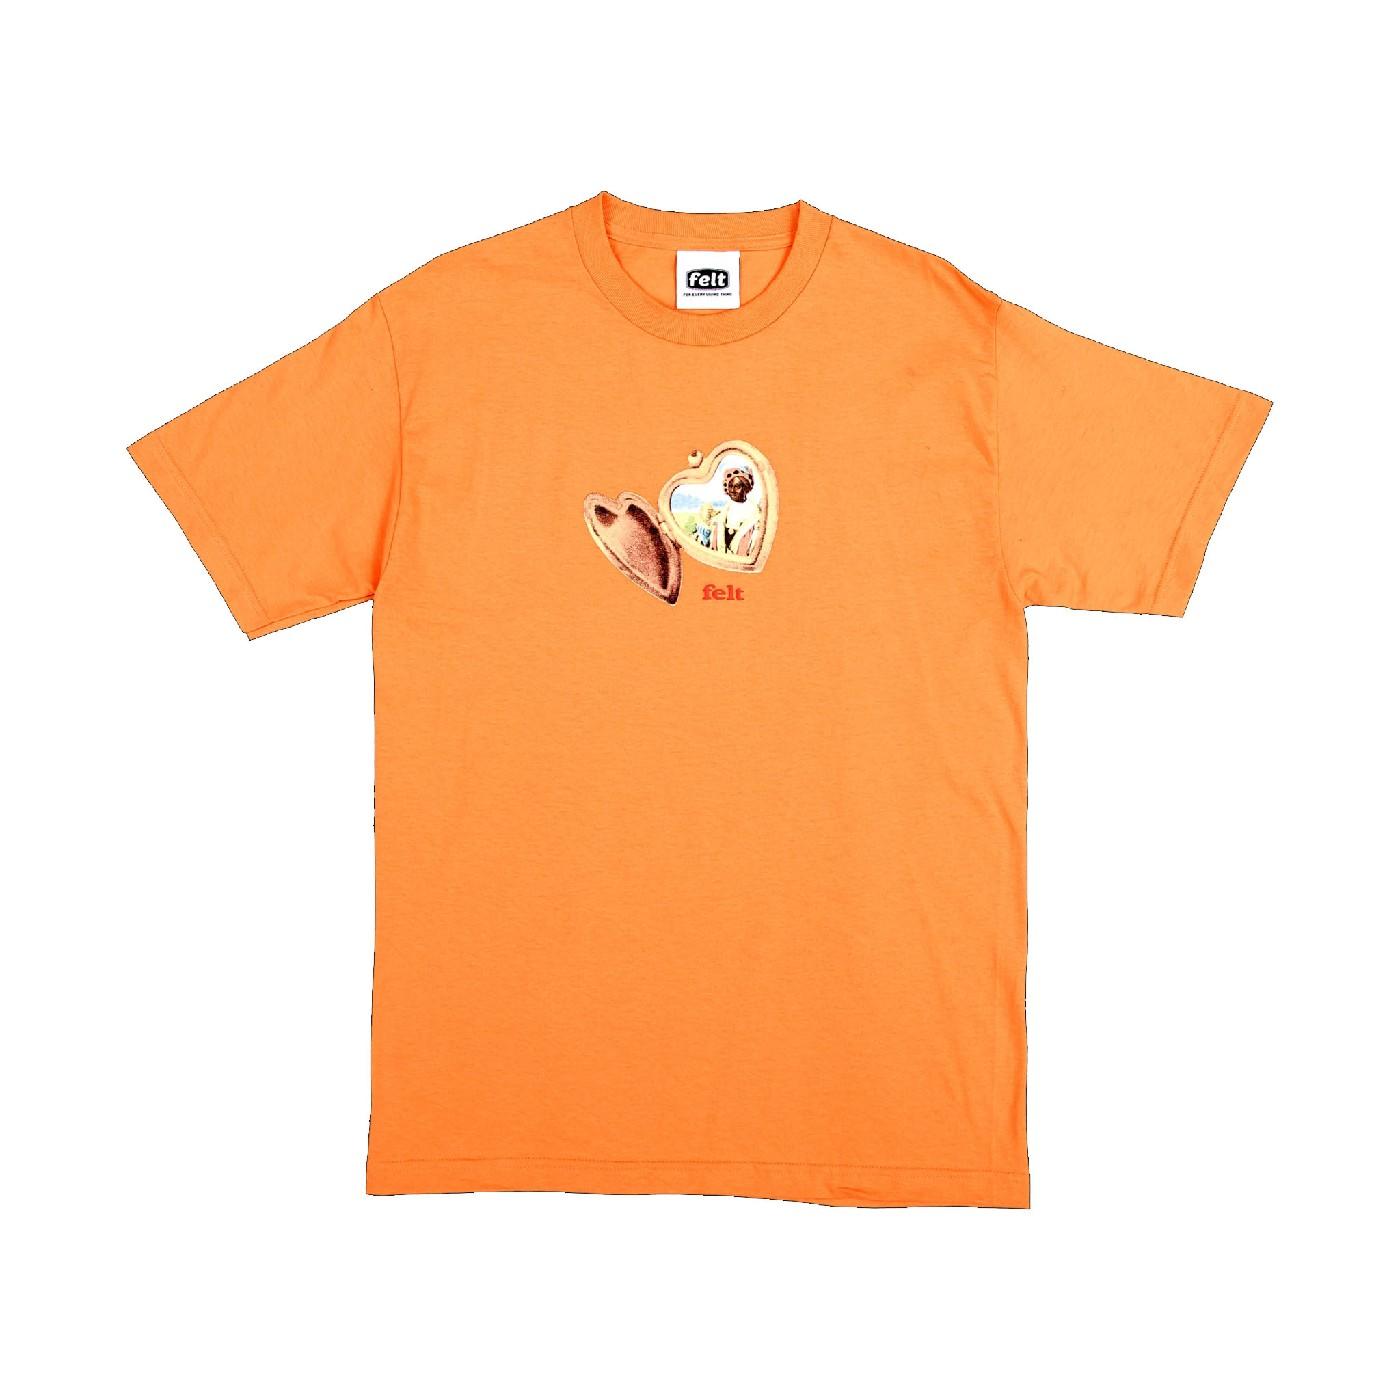 【FELT/フェルト】BLACK MAGUS T-SHIRT Tシャツ / ORN